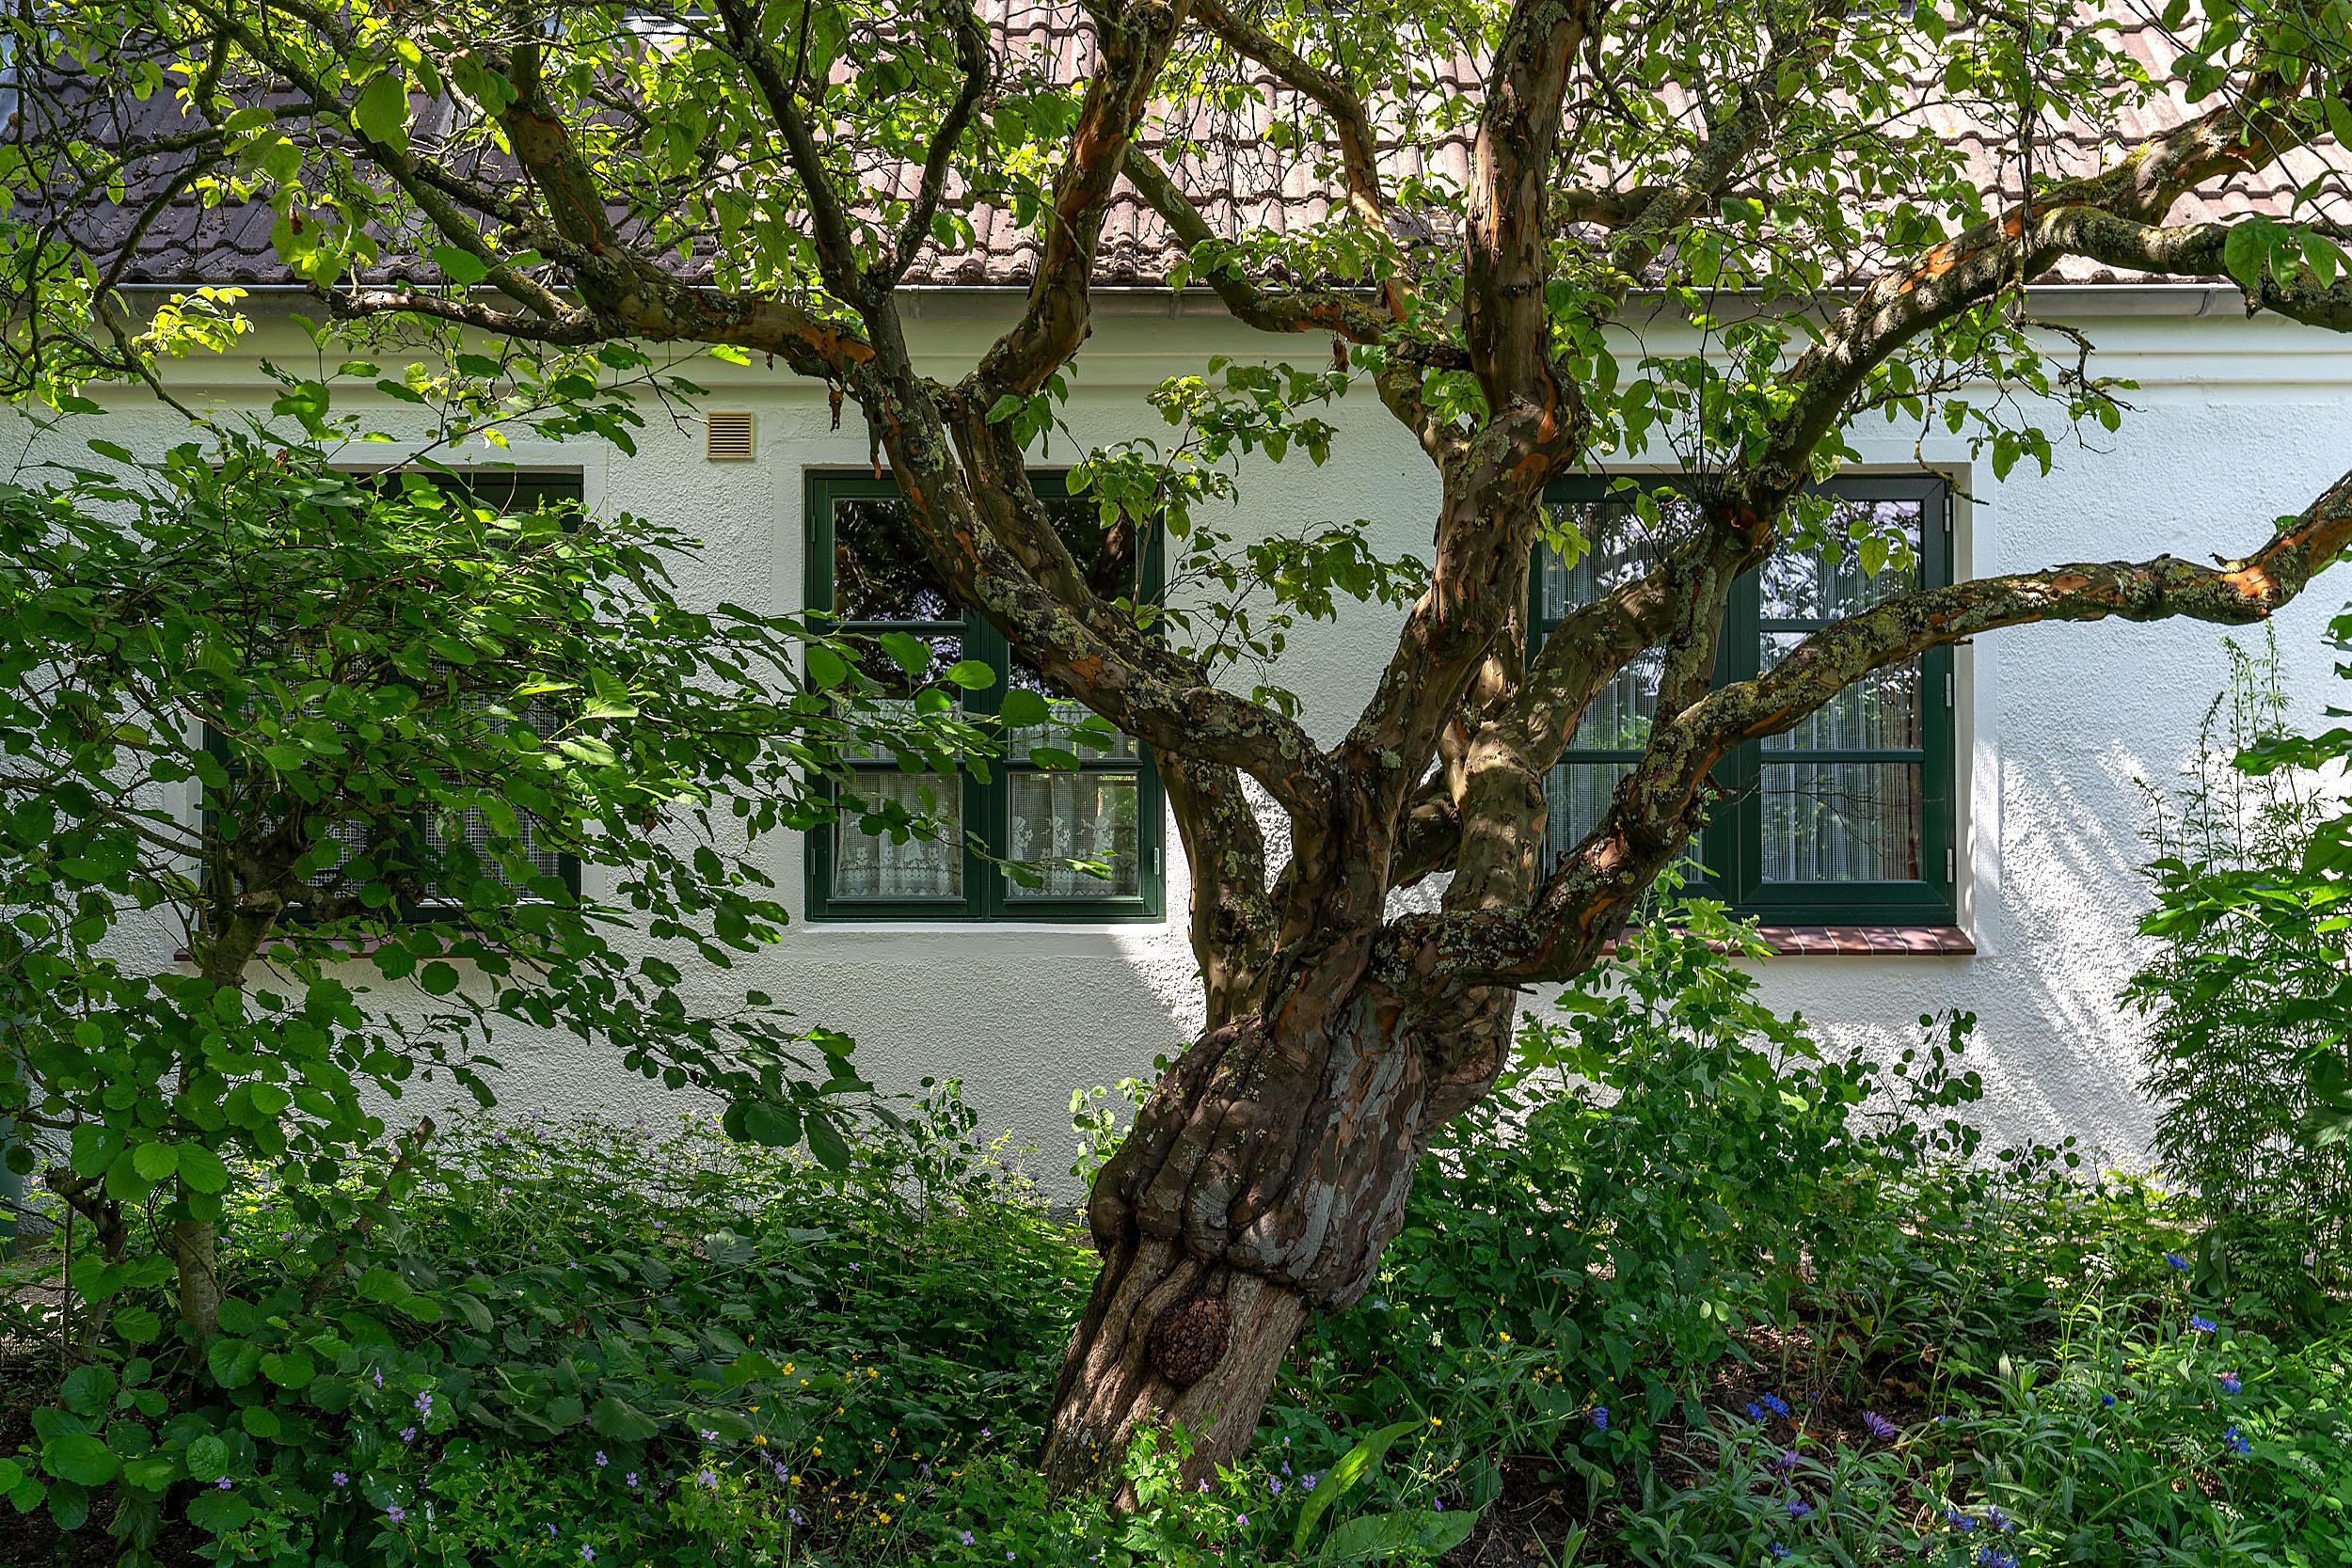 Haus Vogelkiek - Haus